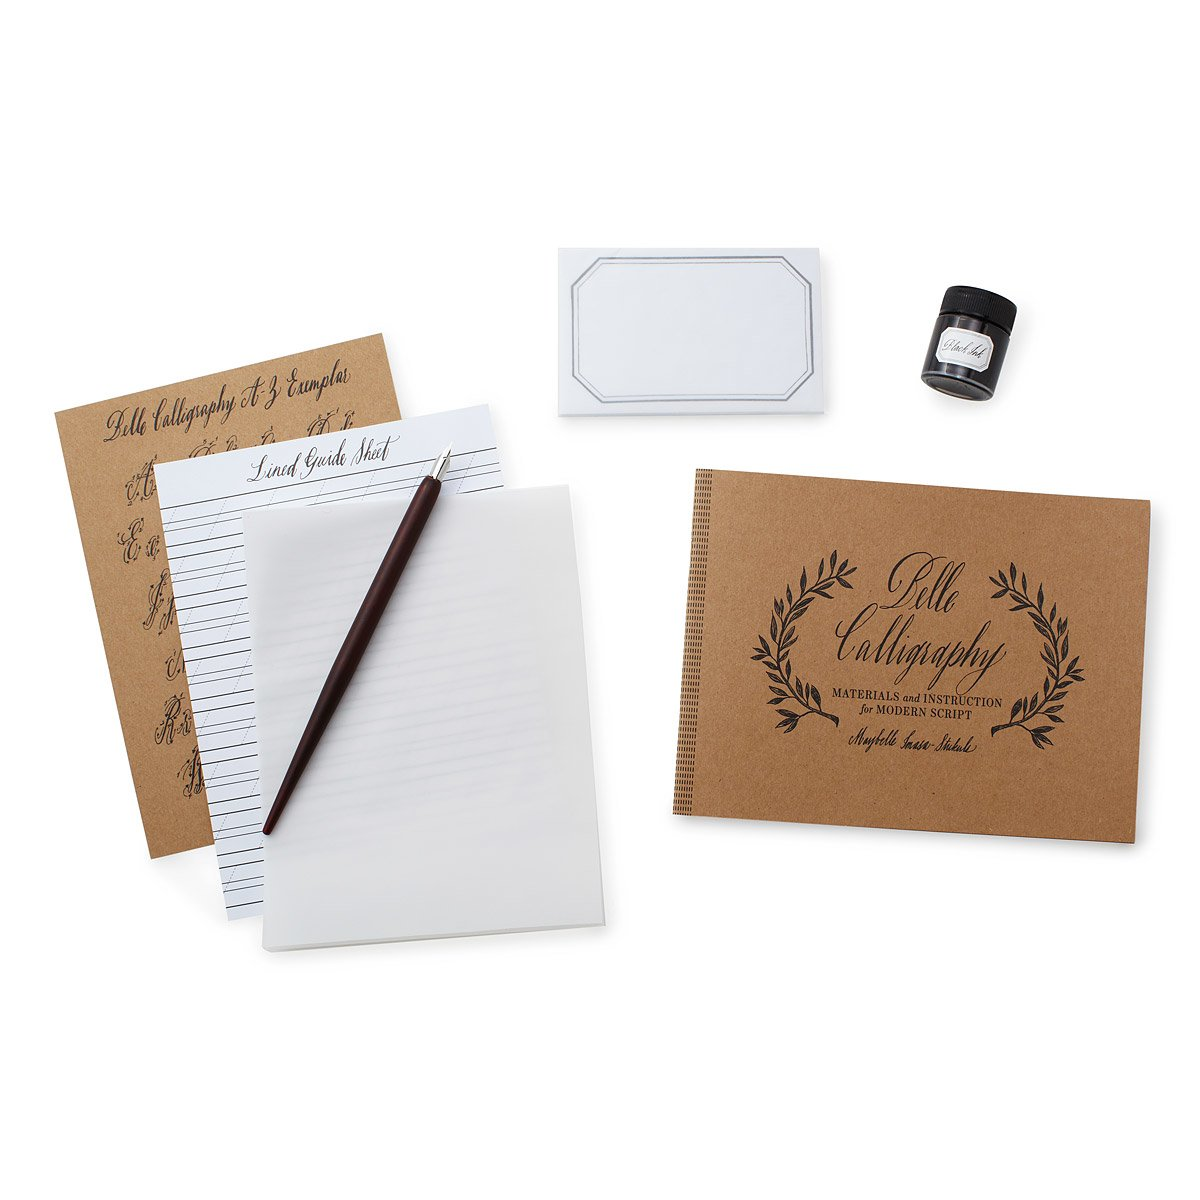 Belle Calligraphy Kit